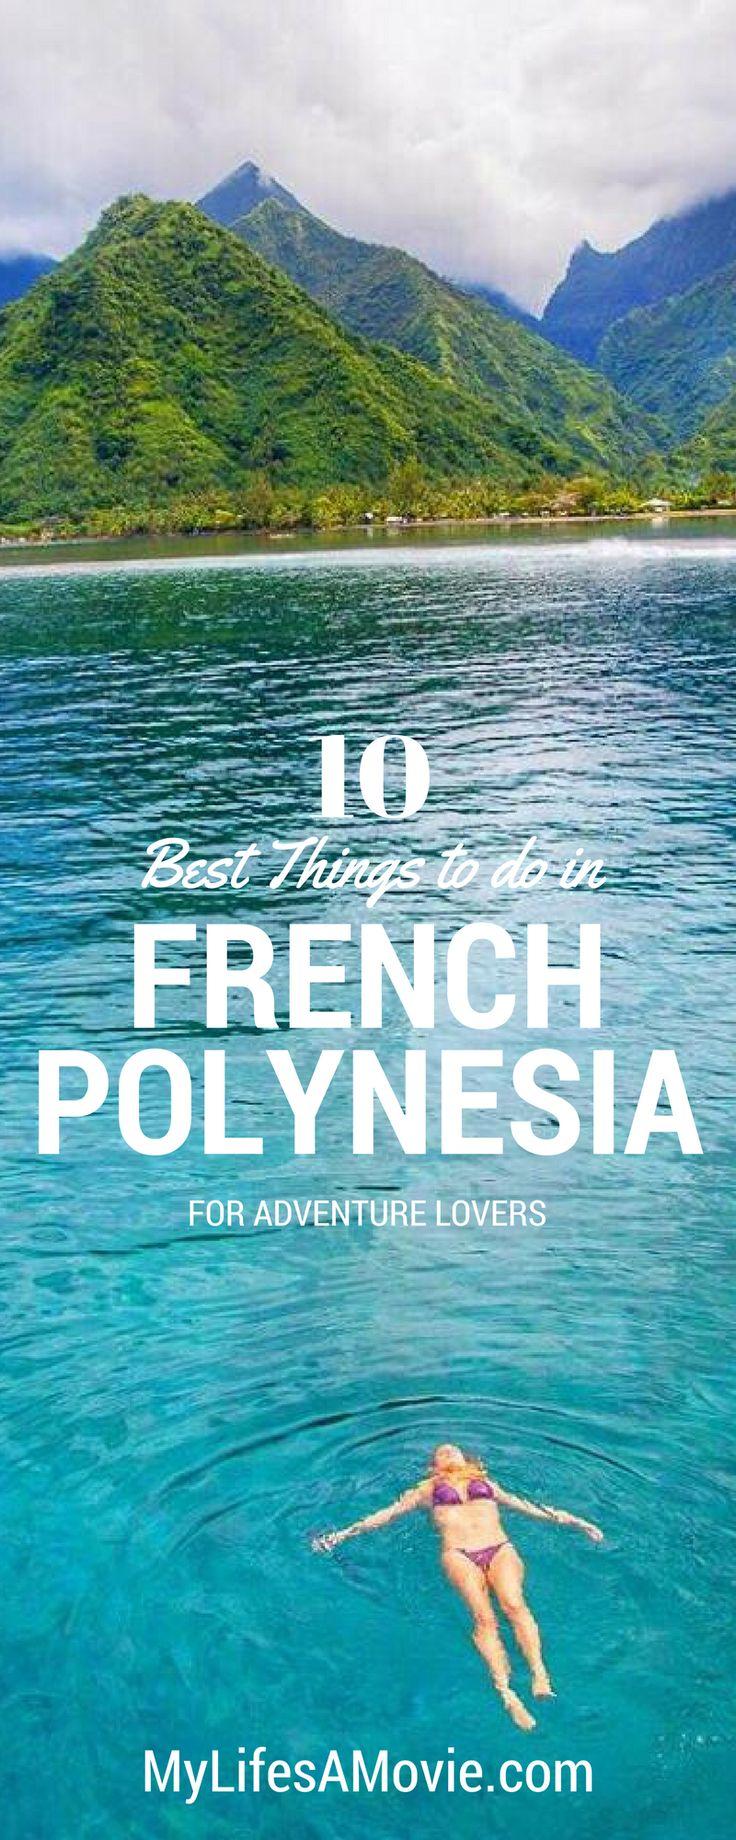 Best Things to do in French Polynesia mylifesamovie.com (2)